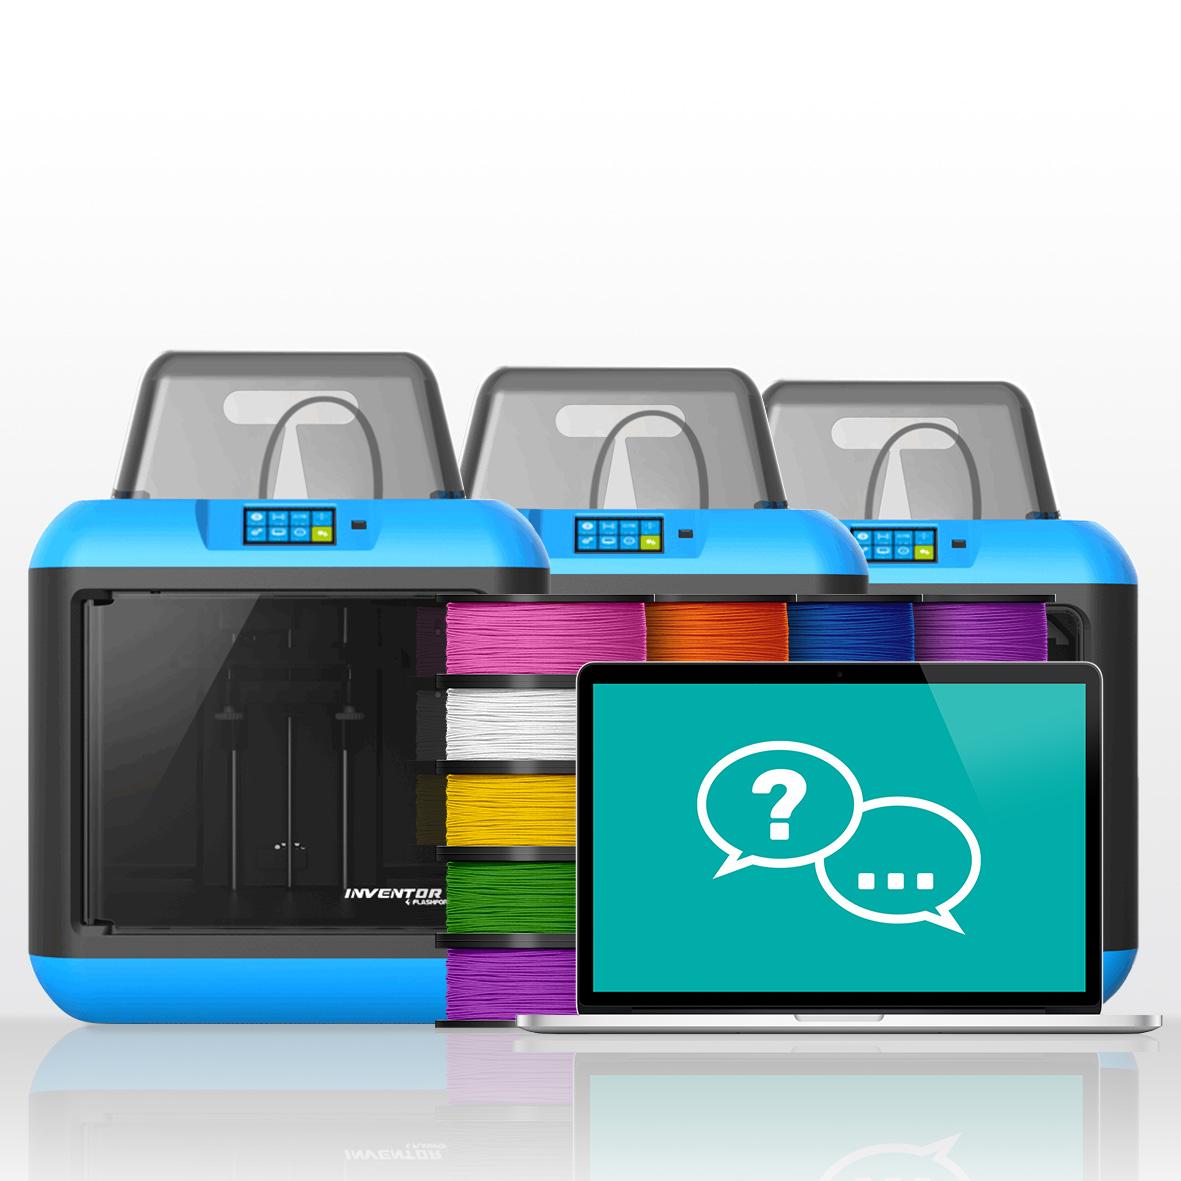 3 Inventor Iis Printer Bundle